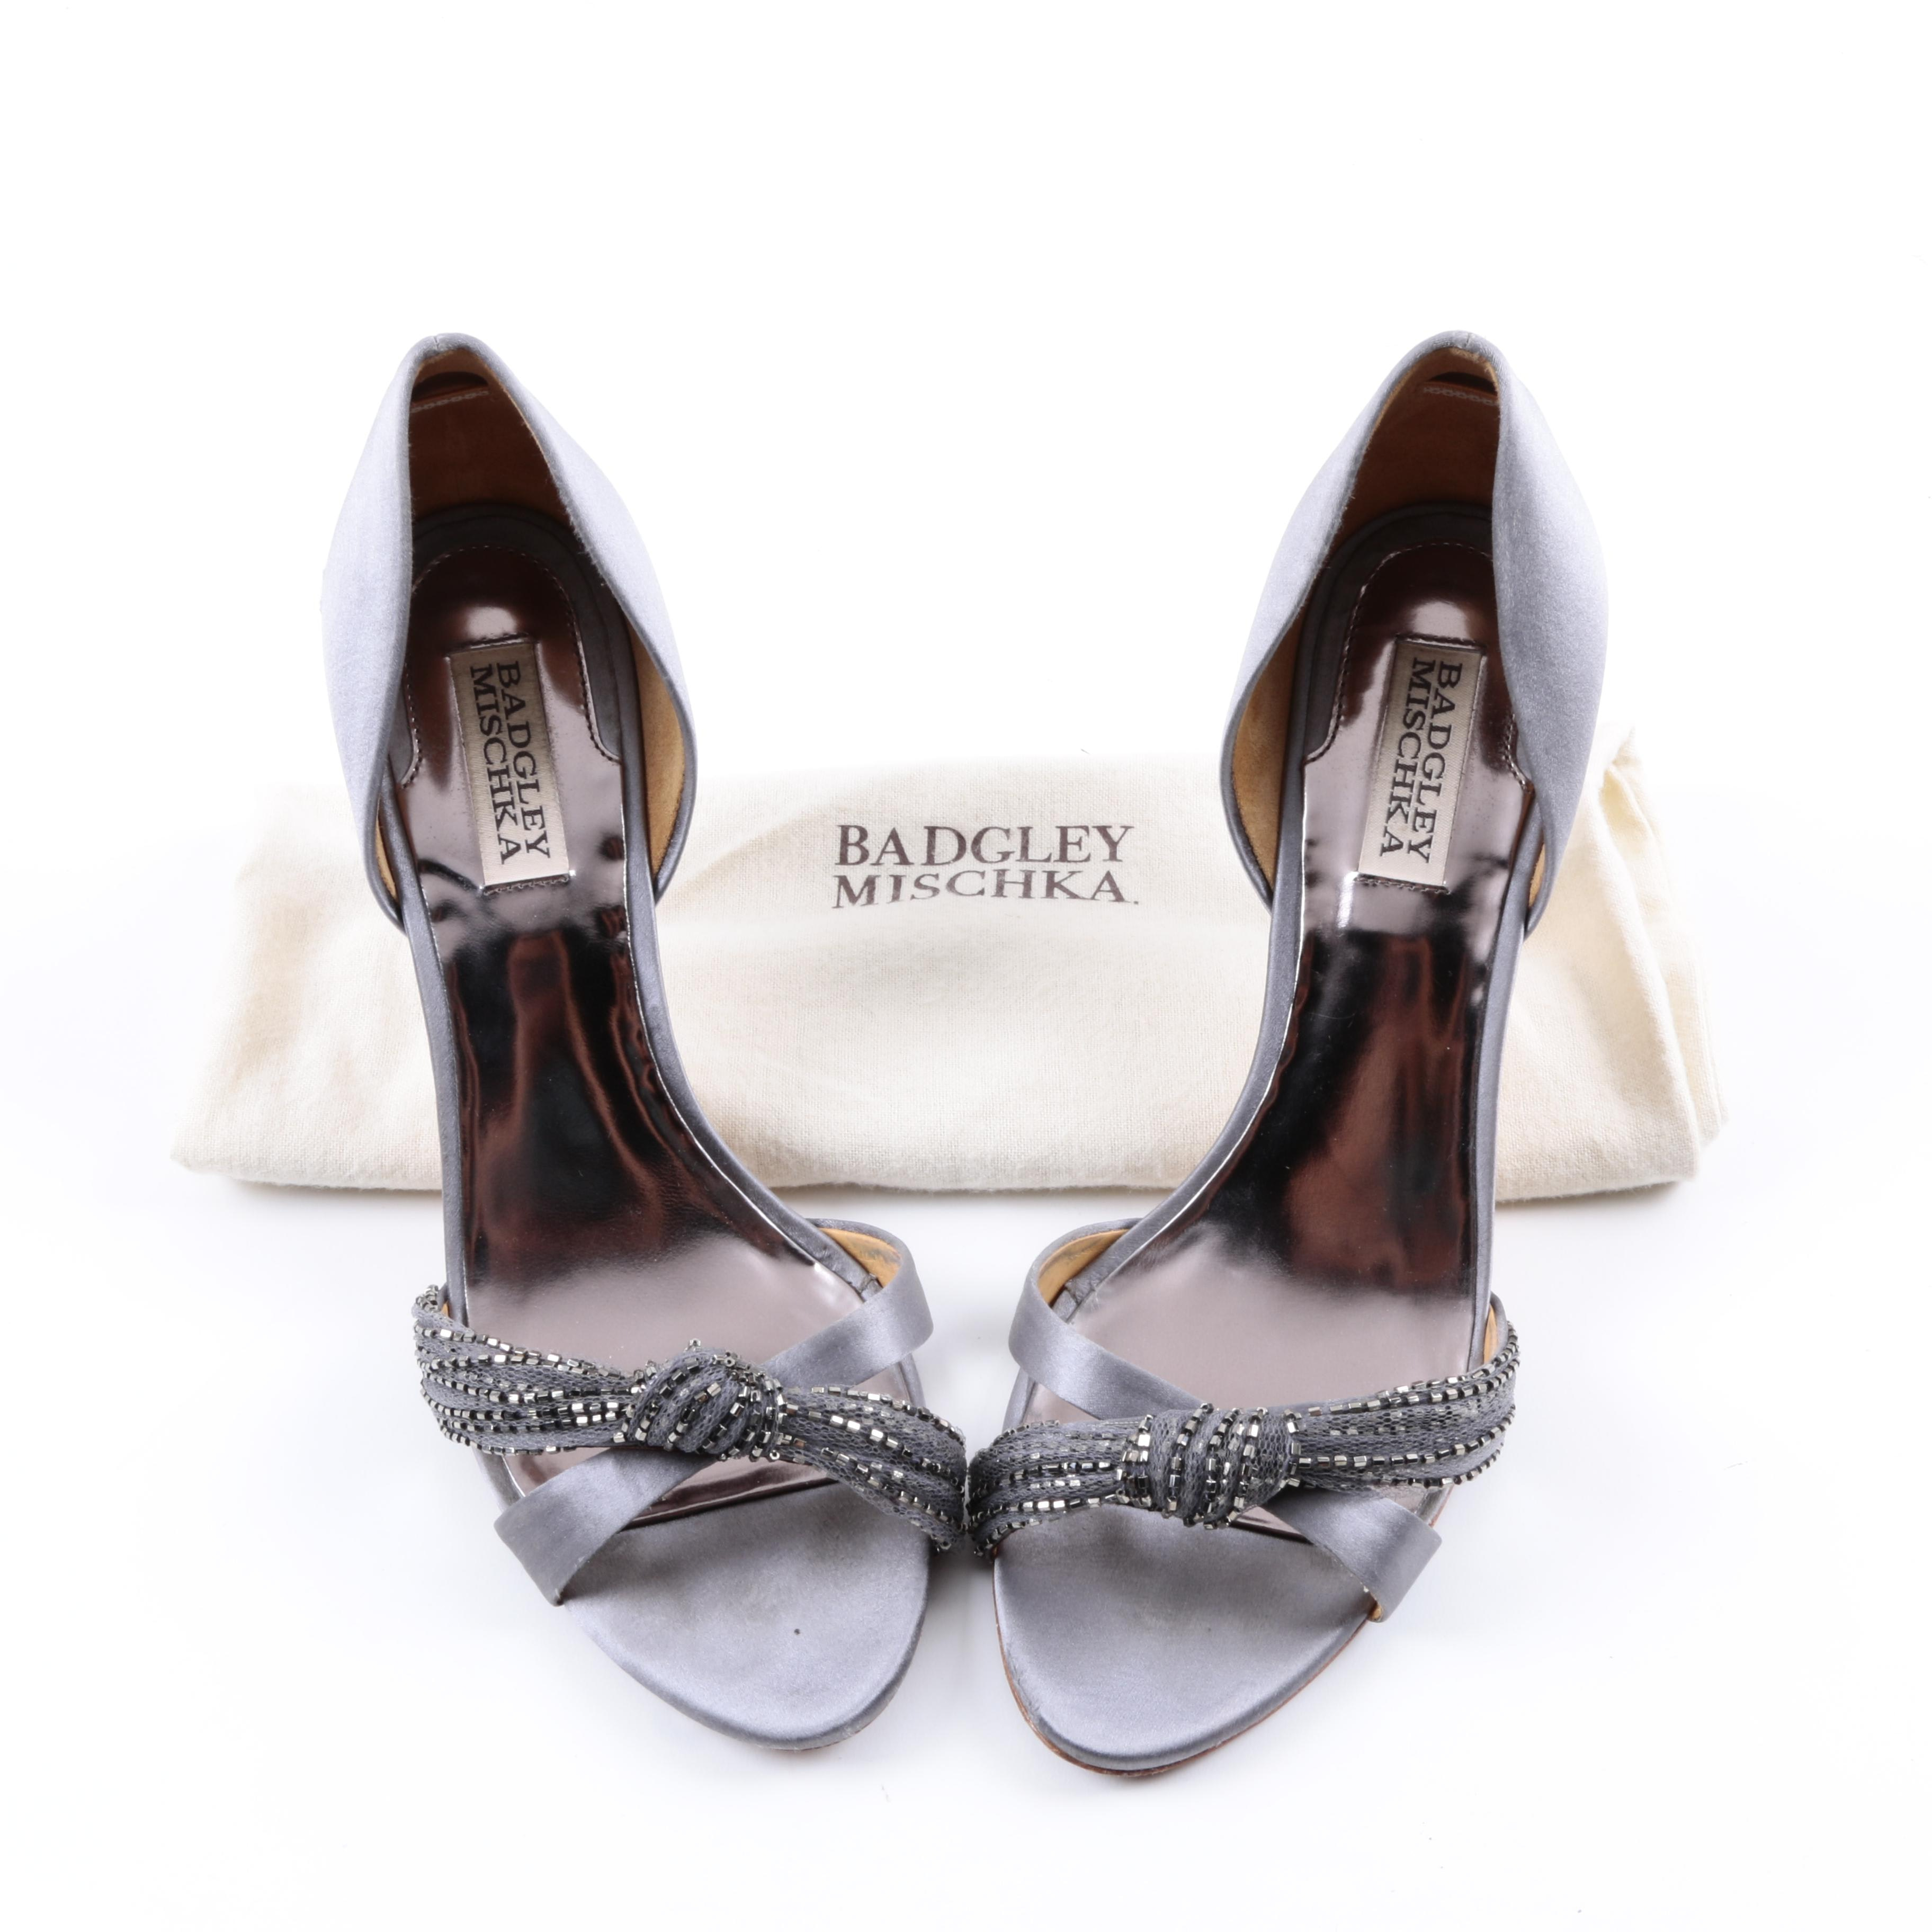 Badgley Mischka Grey Open Toe Stiletto Heels